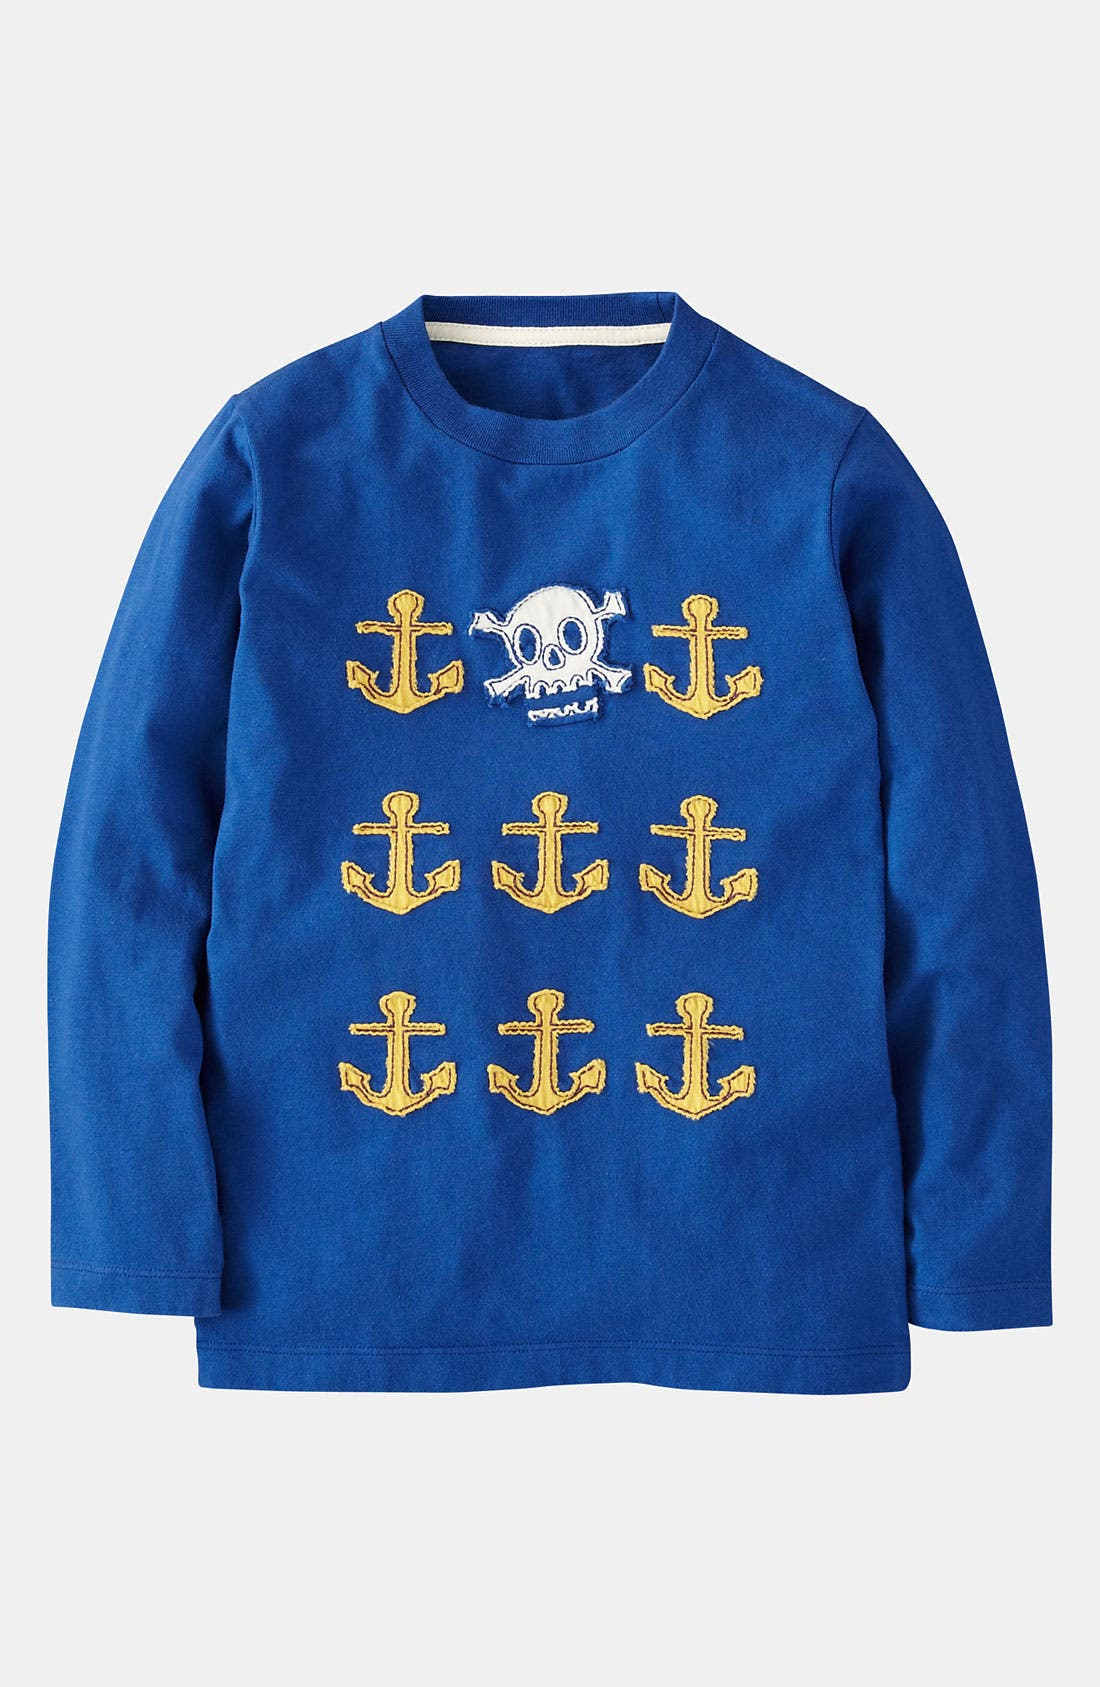 Main Image - Mini Boden 'Multi Logo' T-Shirt (Toddler)